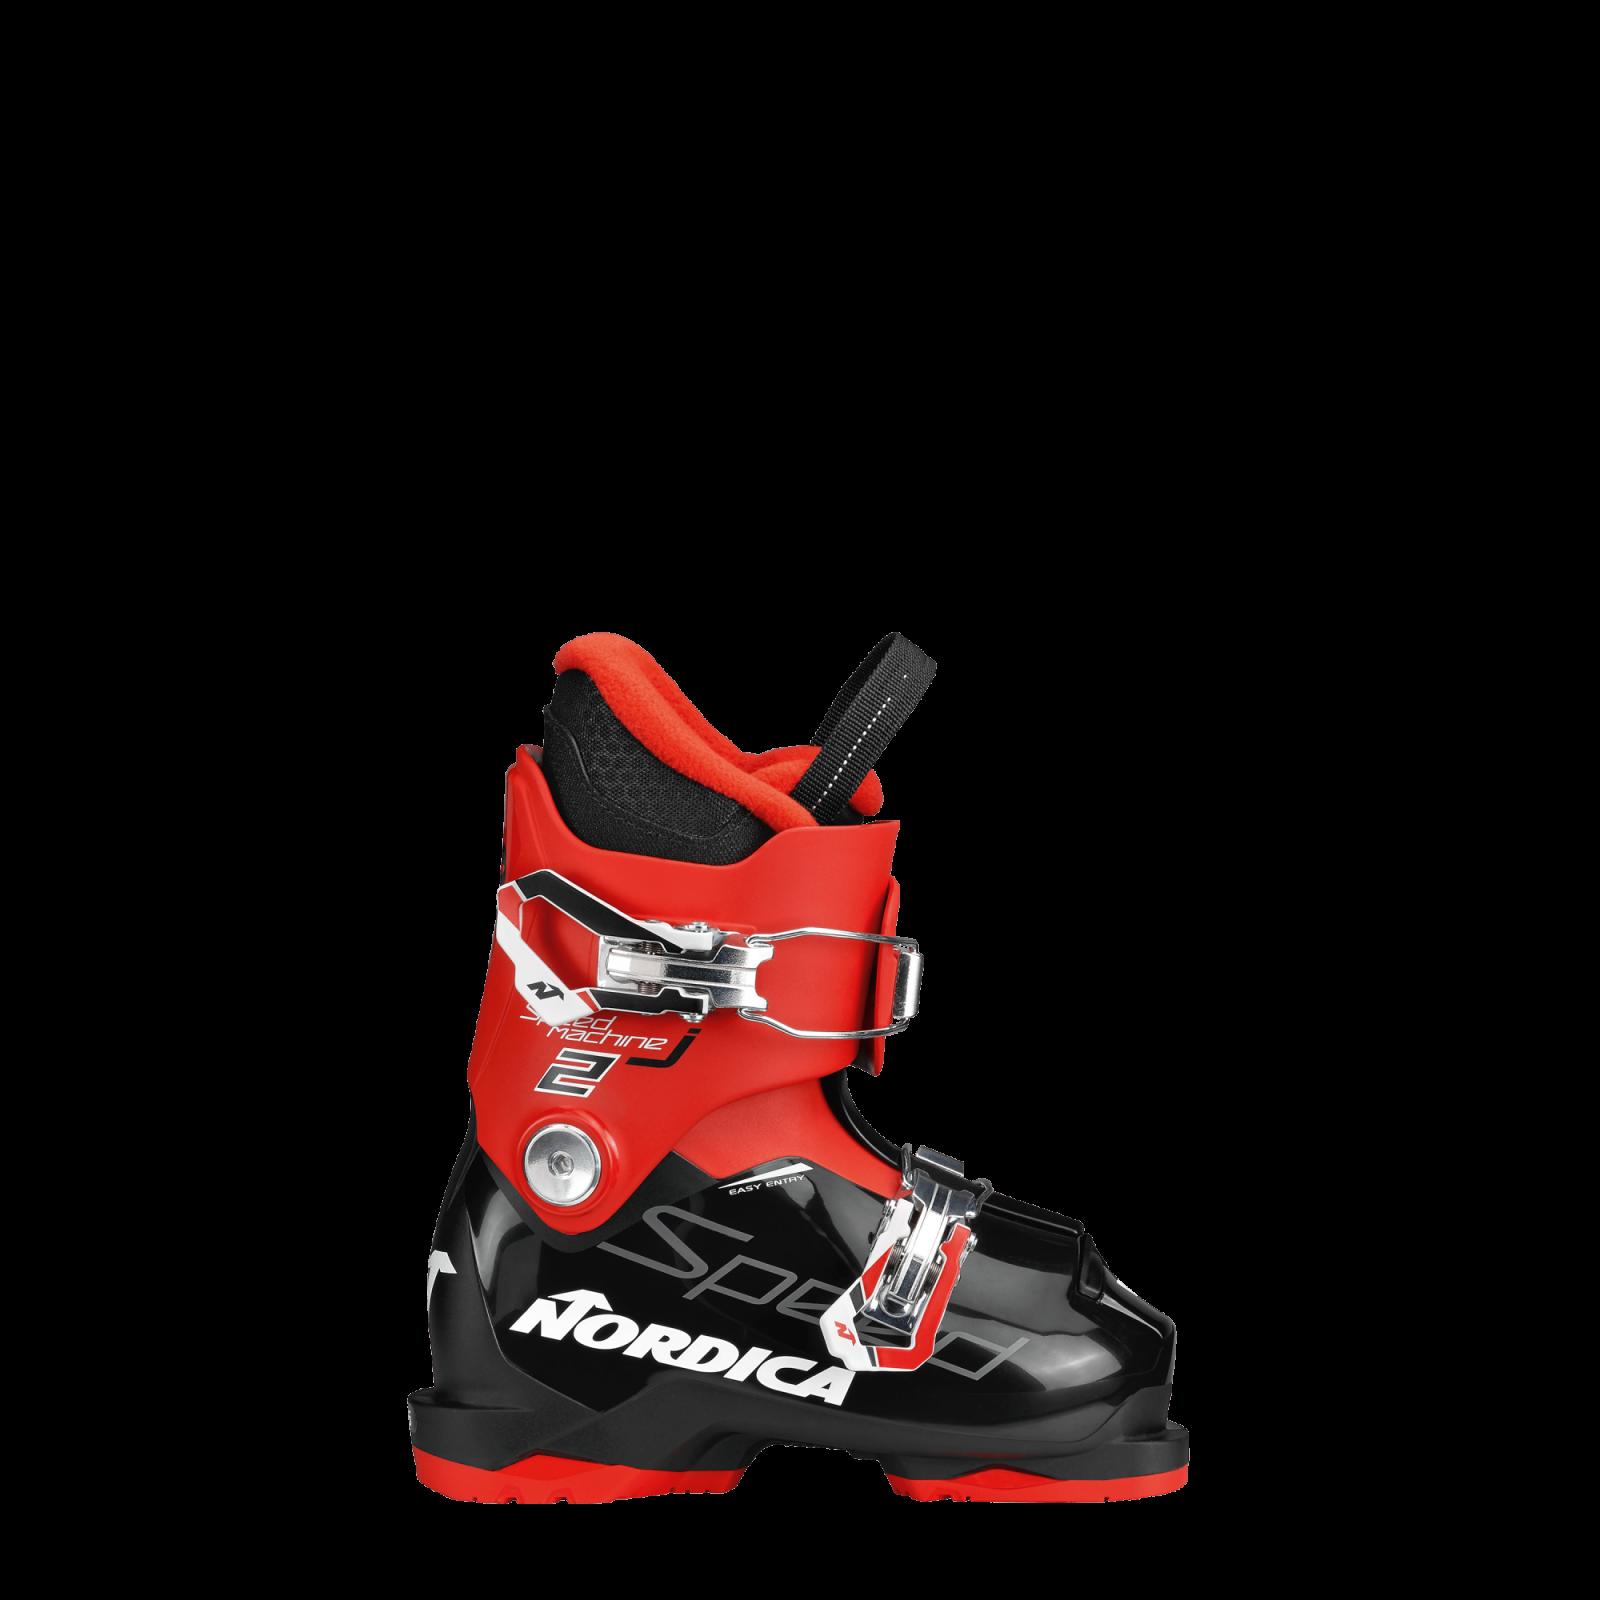 2021 Nordica Speedmachine J2 Youth Ski Boots